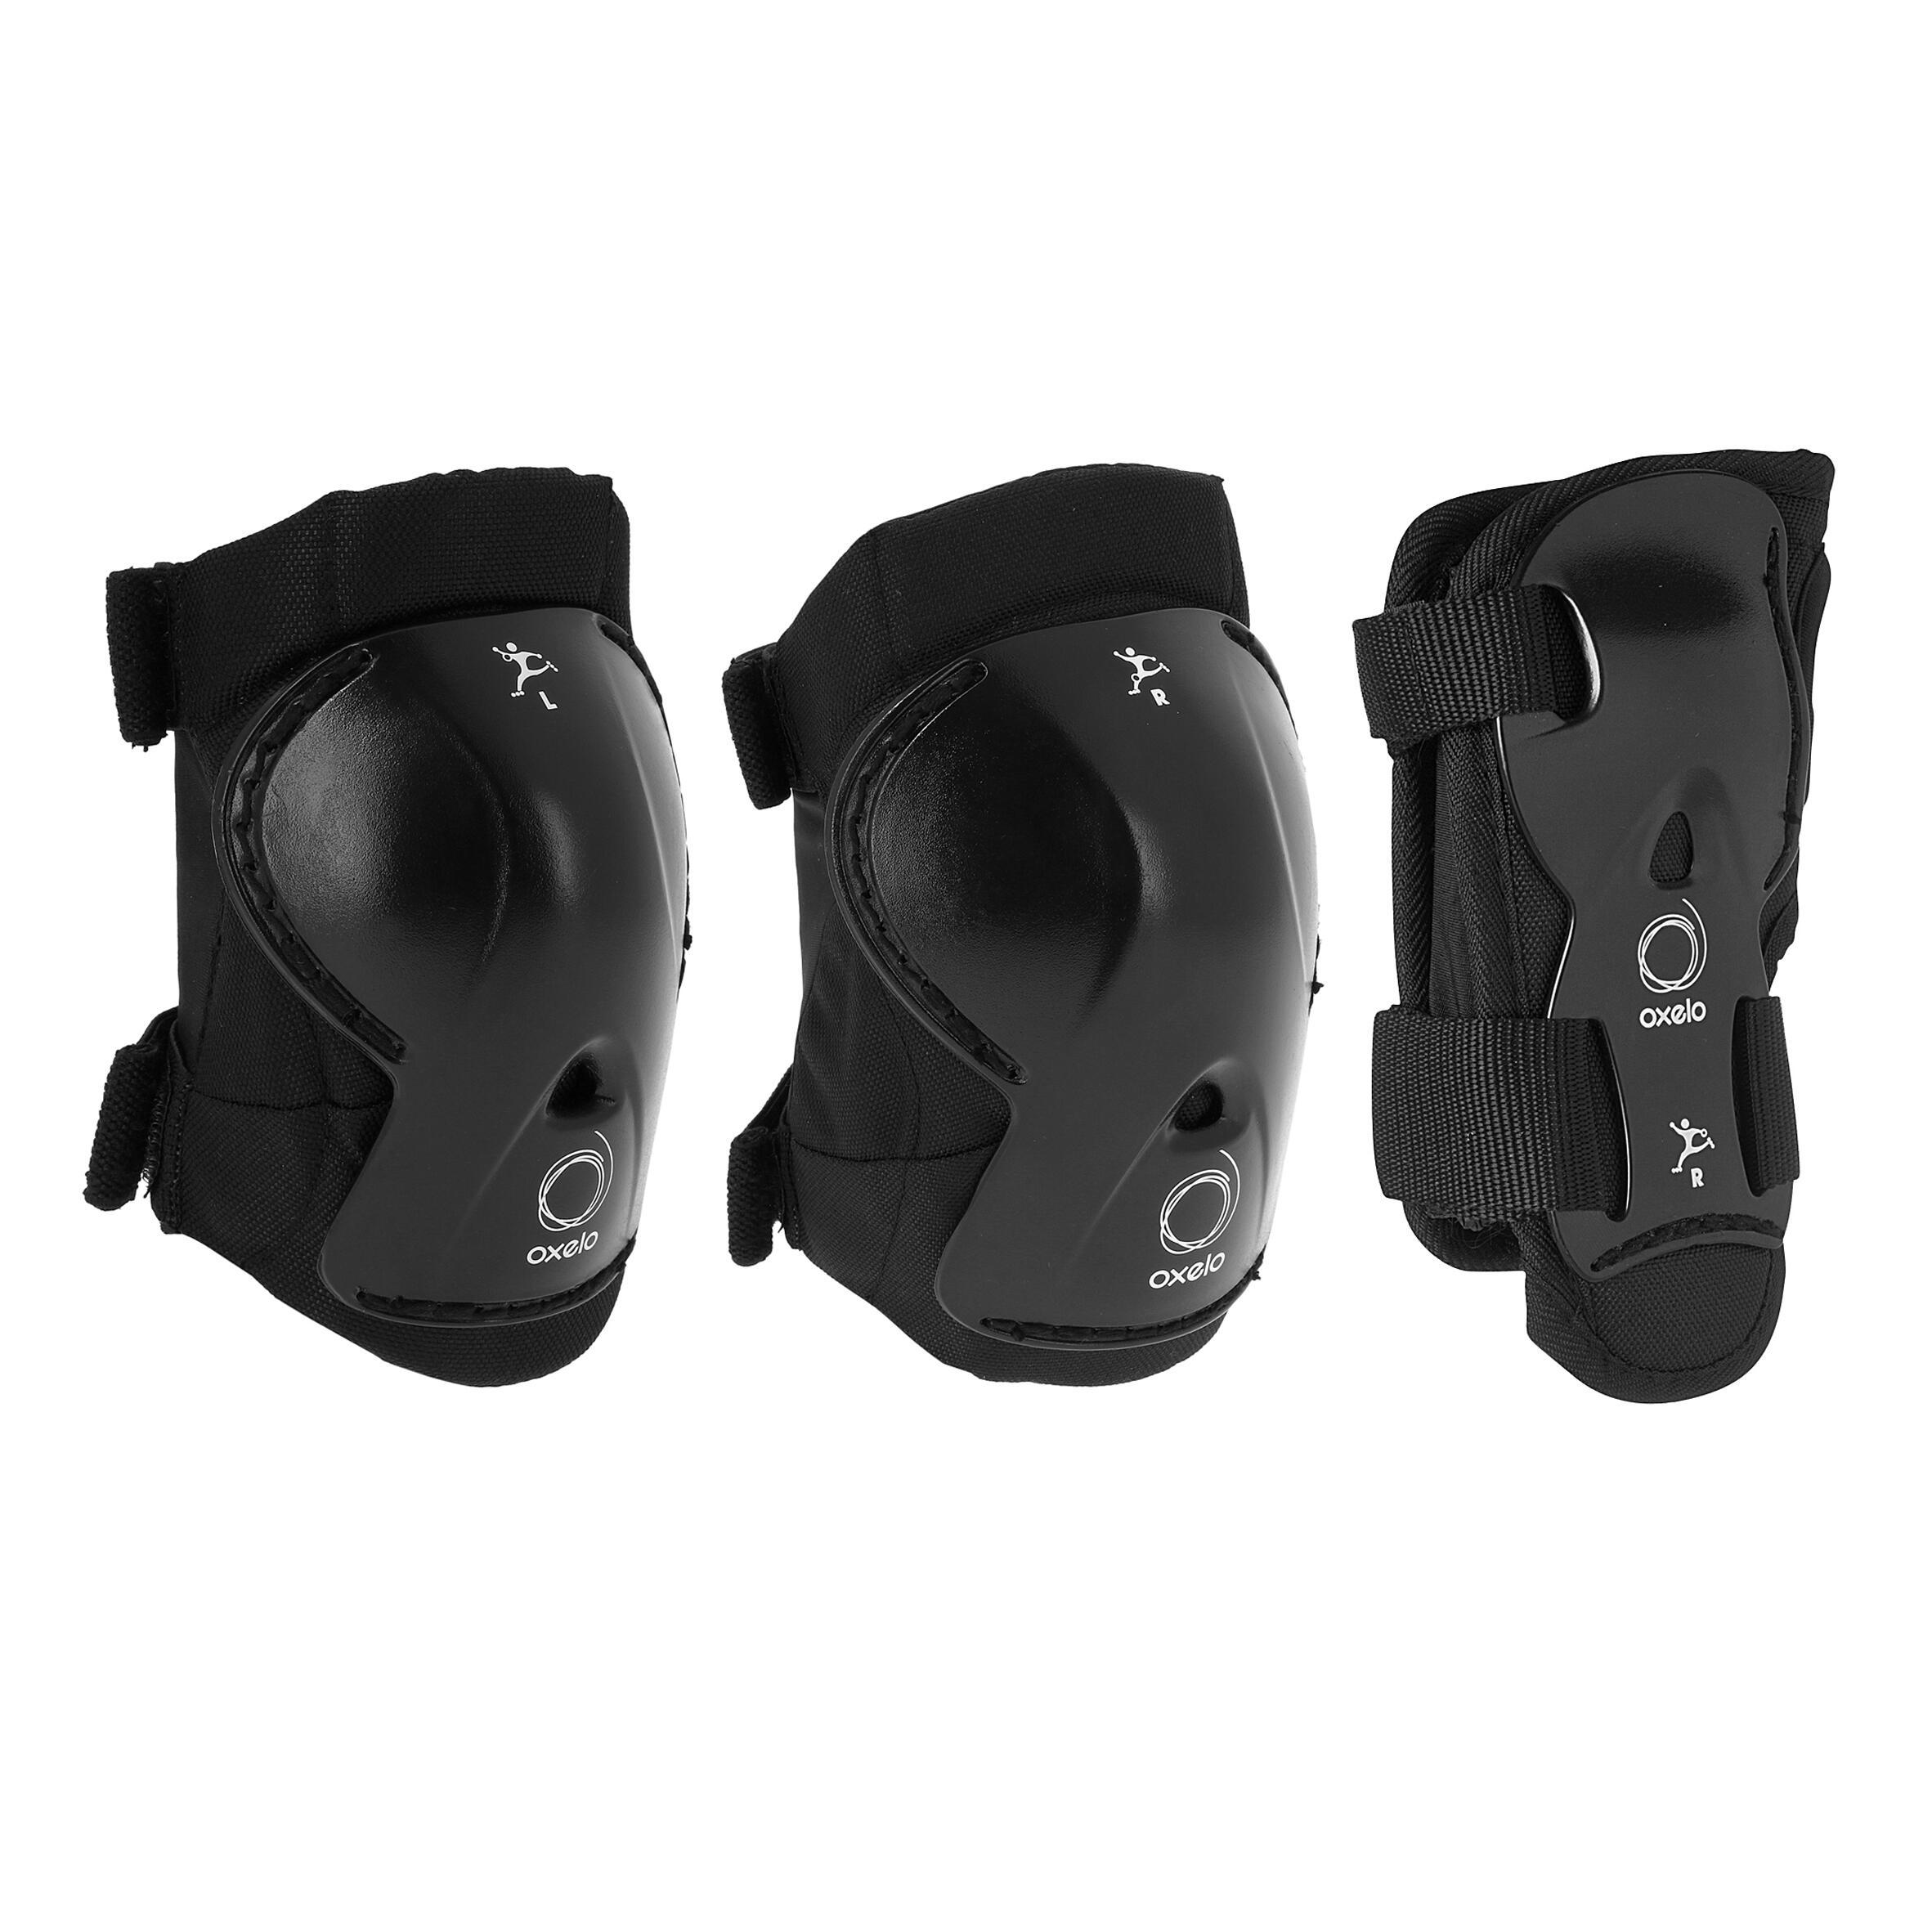 Set 3 protecciones patinaje niños BASIC negro